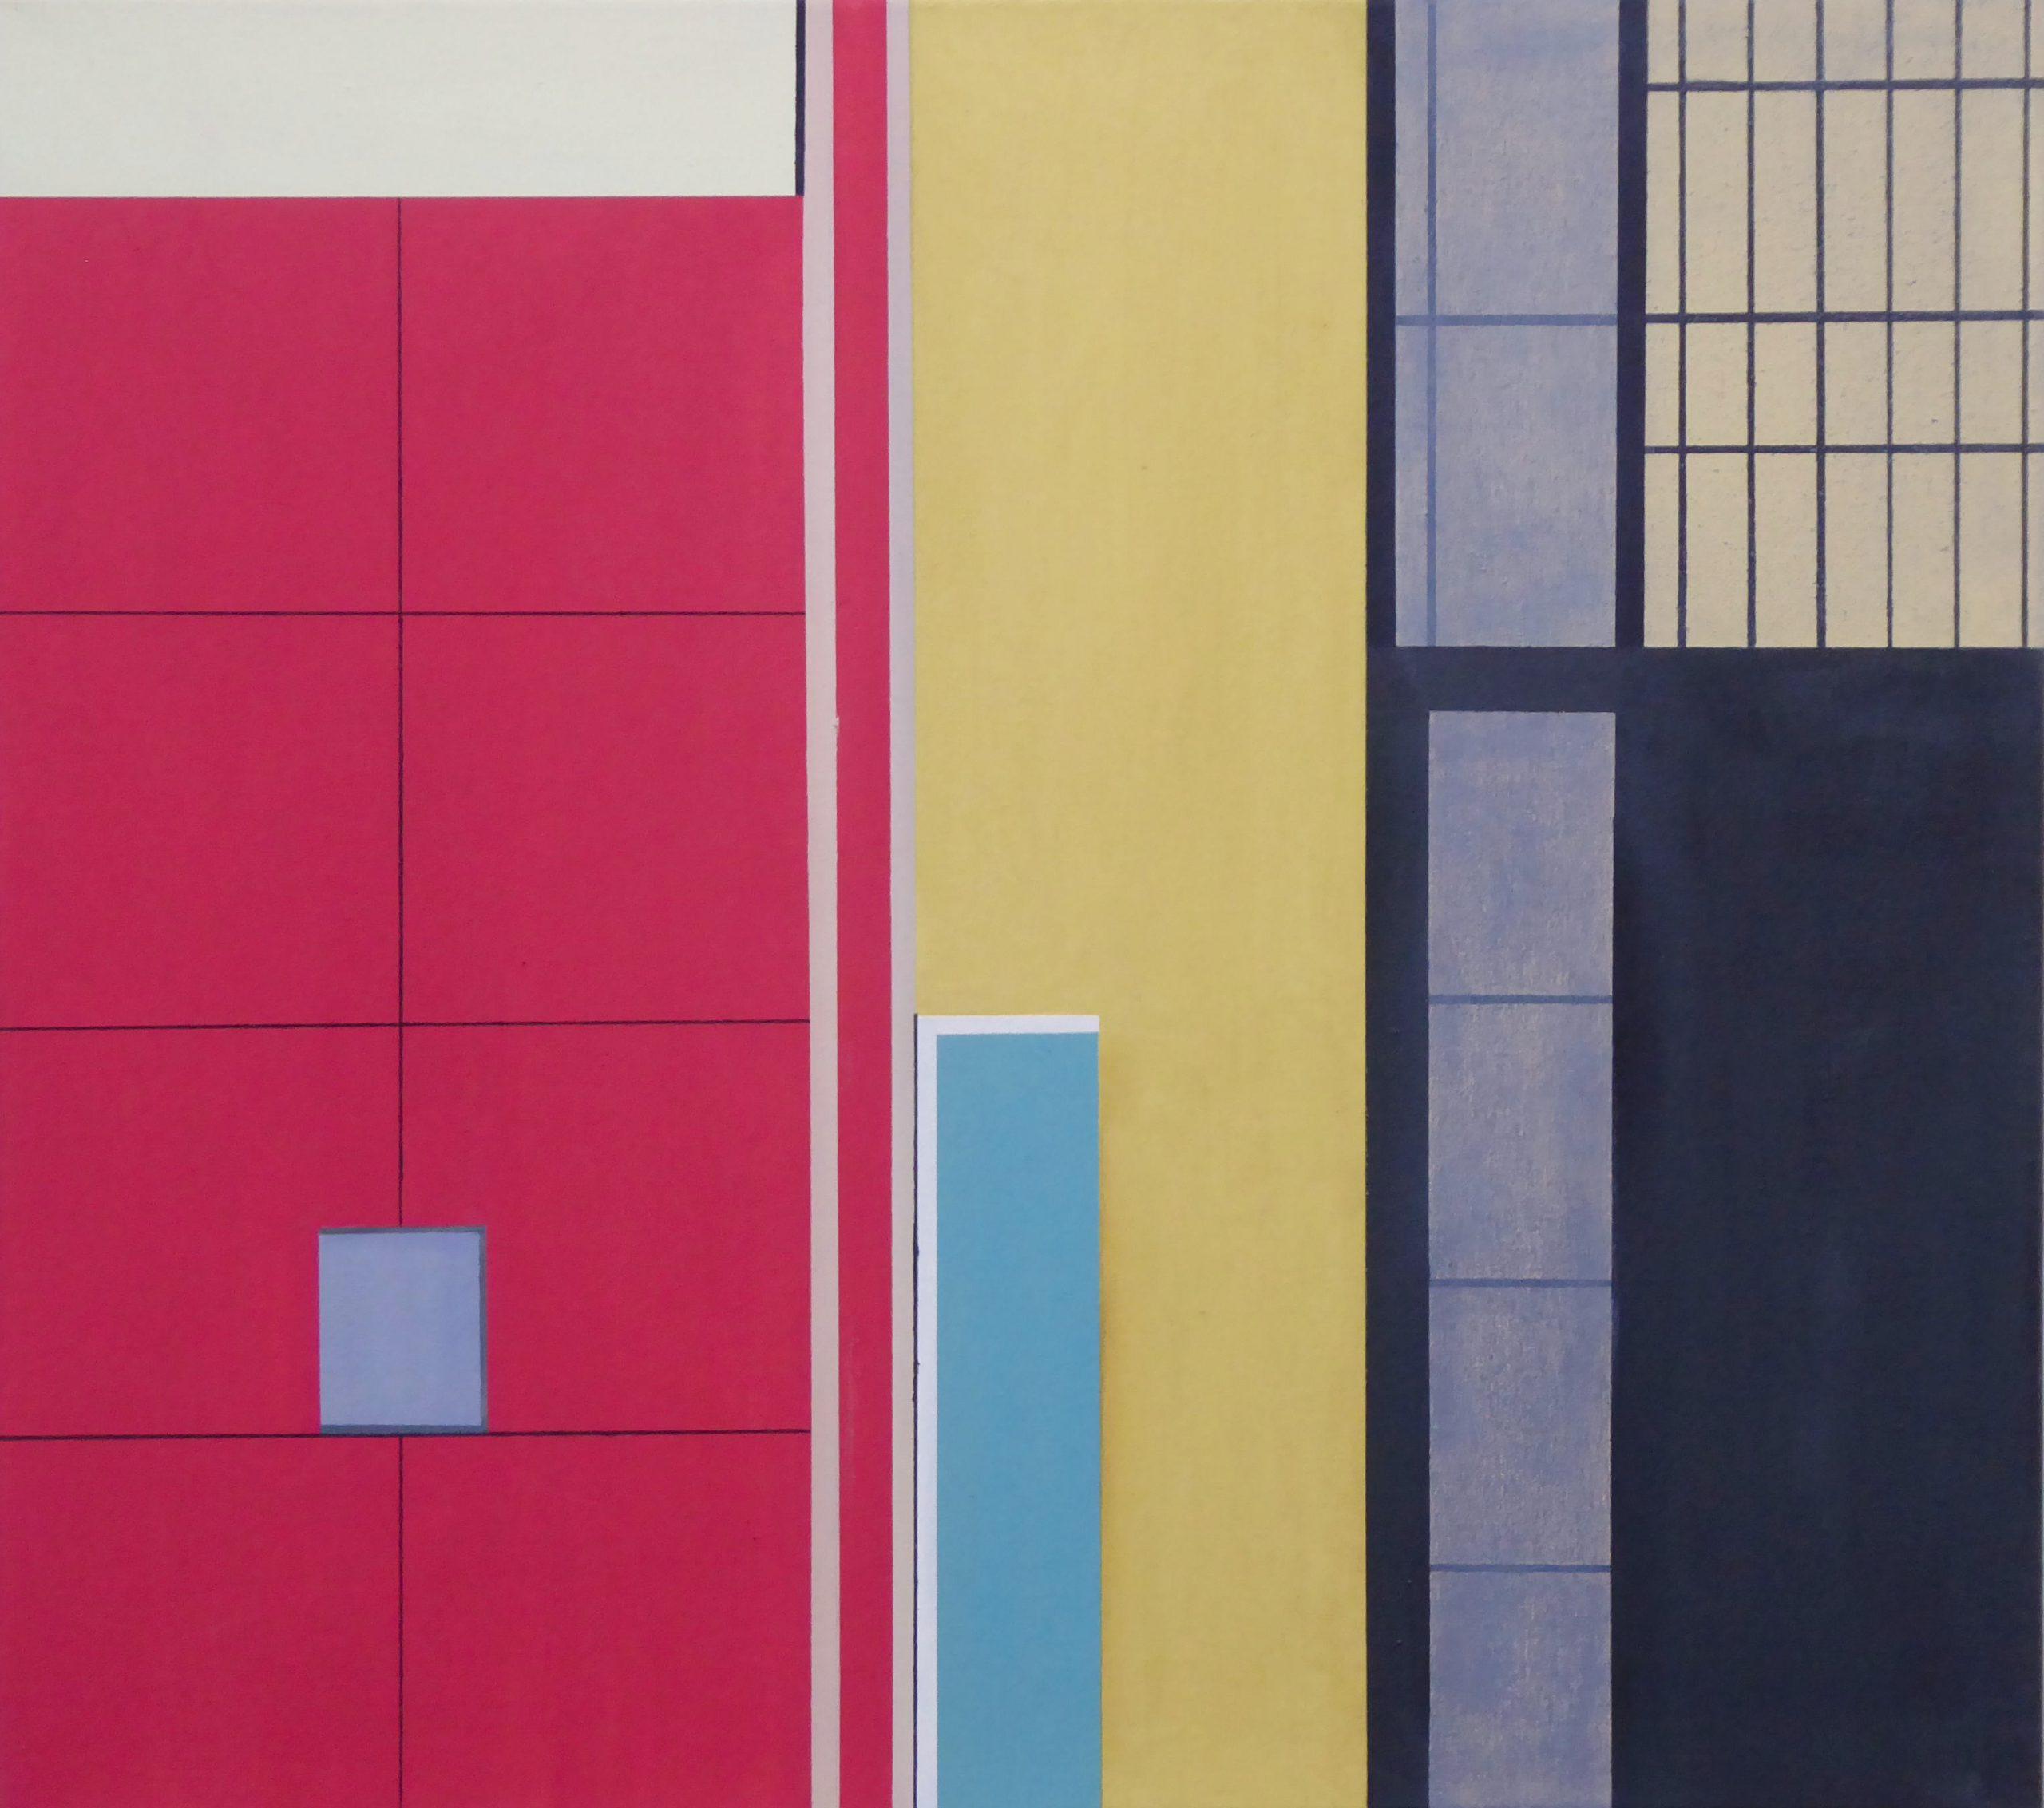 Dumaguete VII,  2018, 45 x 50 cm, Öl/Lw, Oil on Canvas